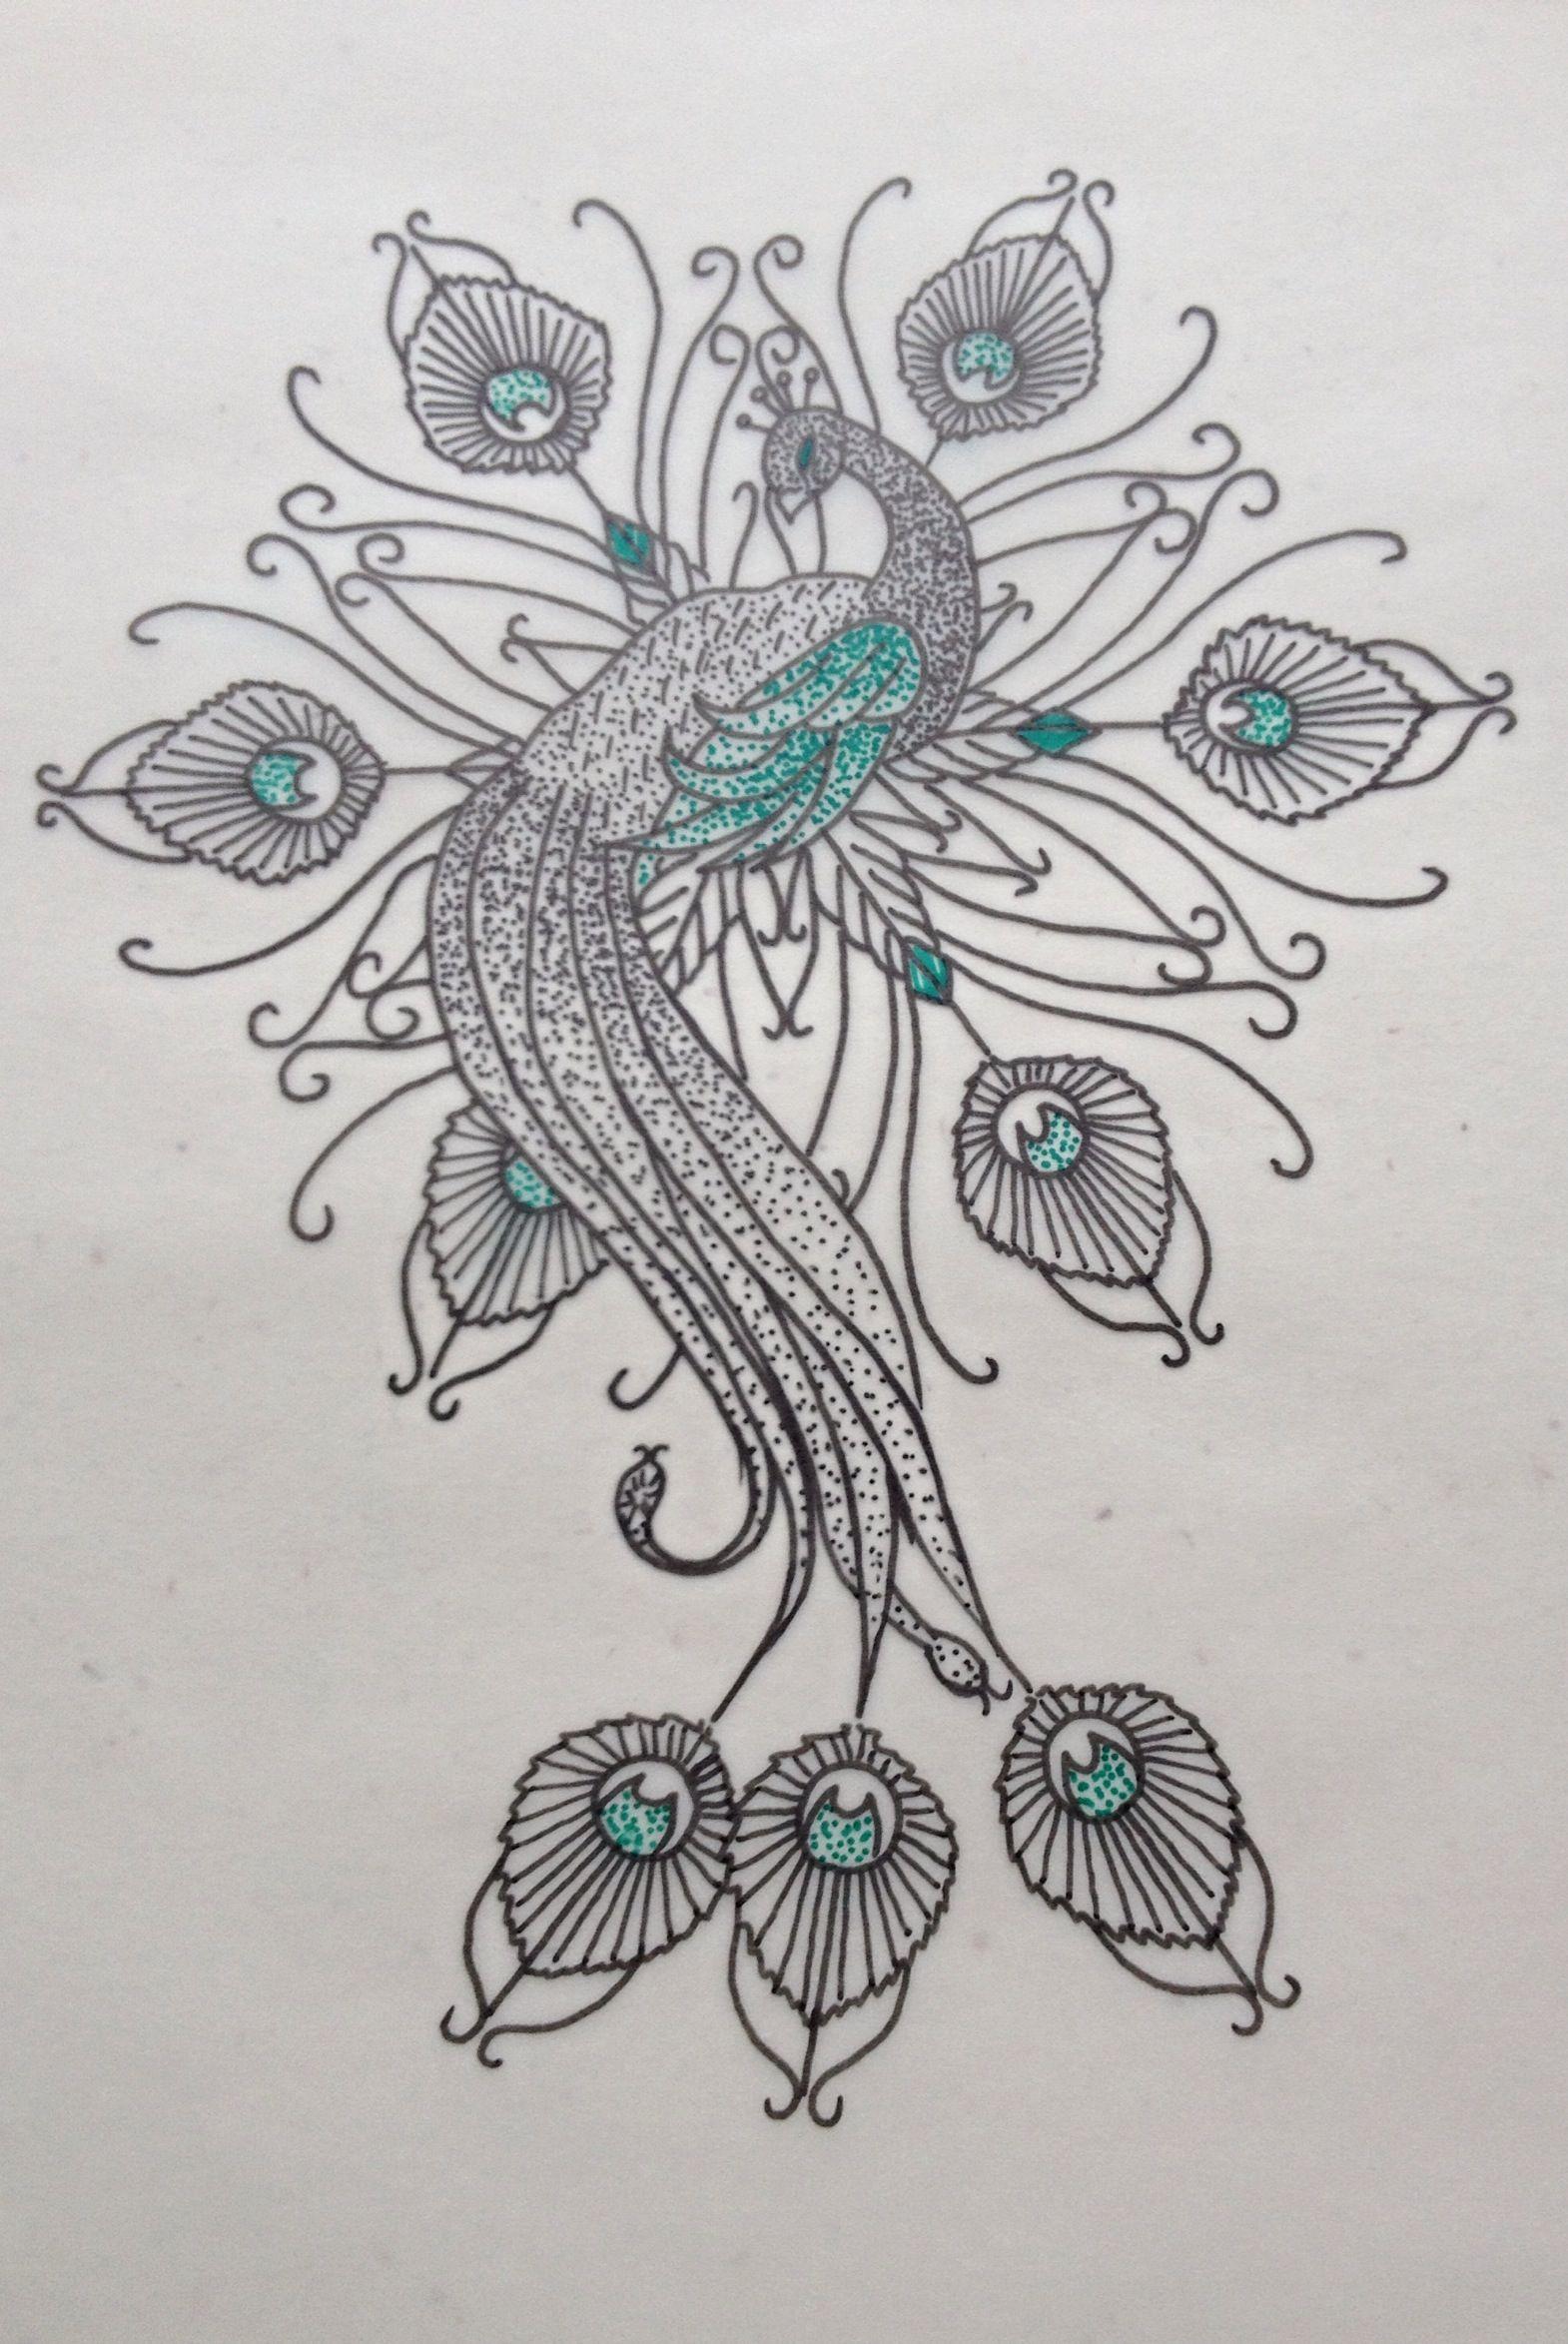 eda646a67 Peacock Mandala | w o r l d | Peacock tattoo, Mandala tattoo, Tattoos